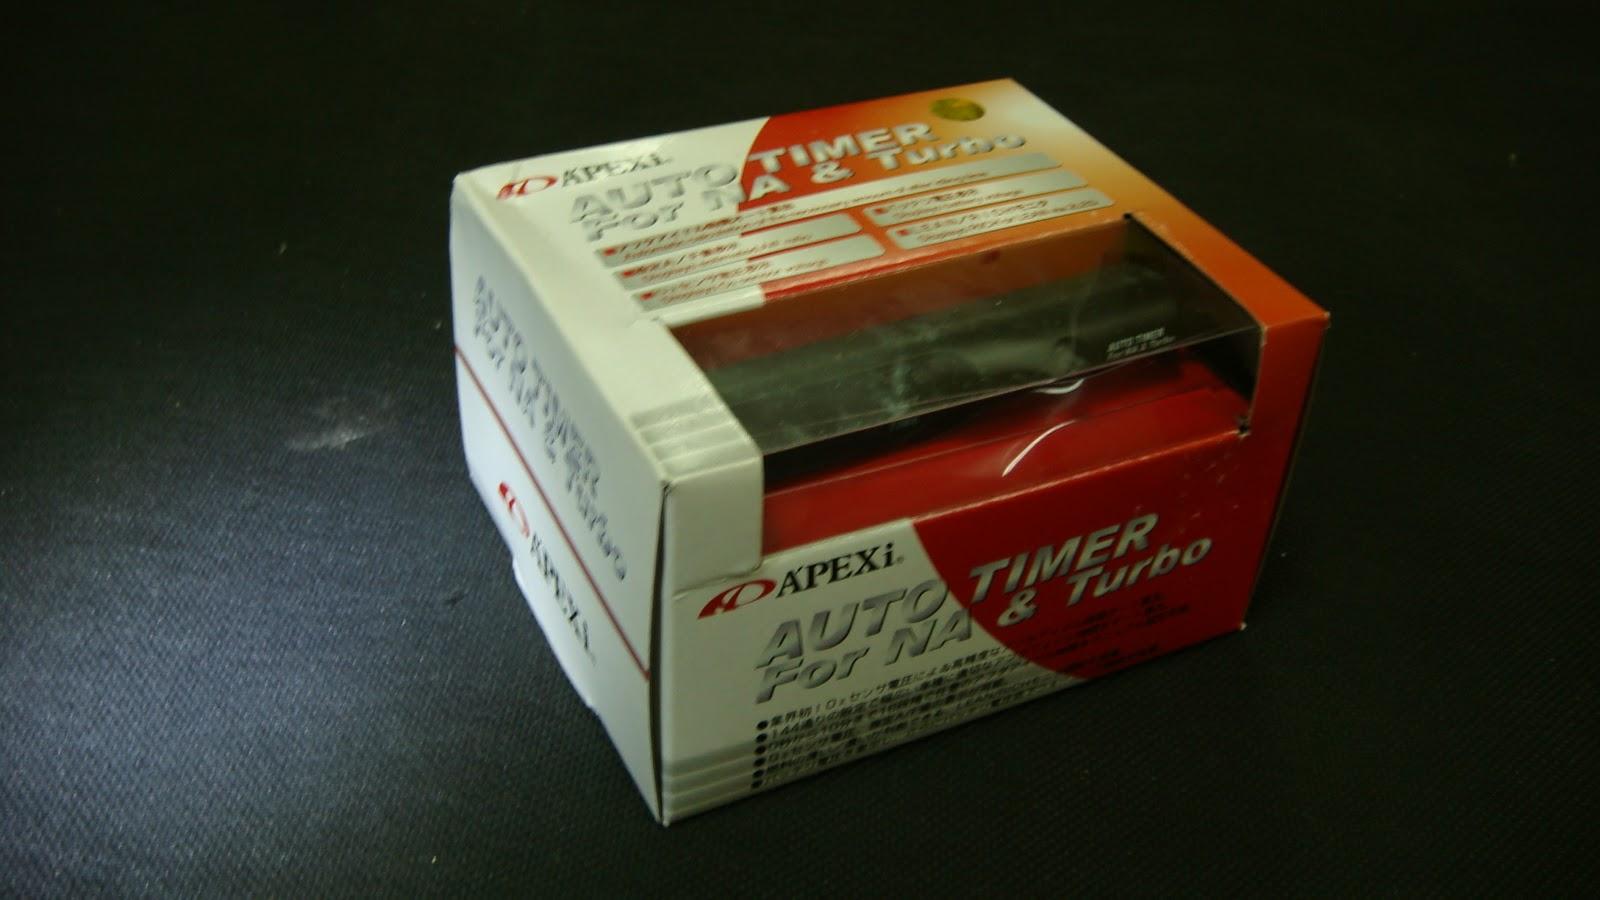 Apexi Pen Turbo Timer Wiring Diagram Online Skatuner Auto Parts